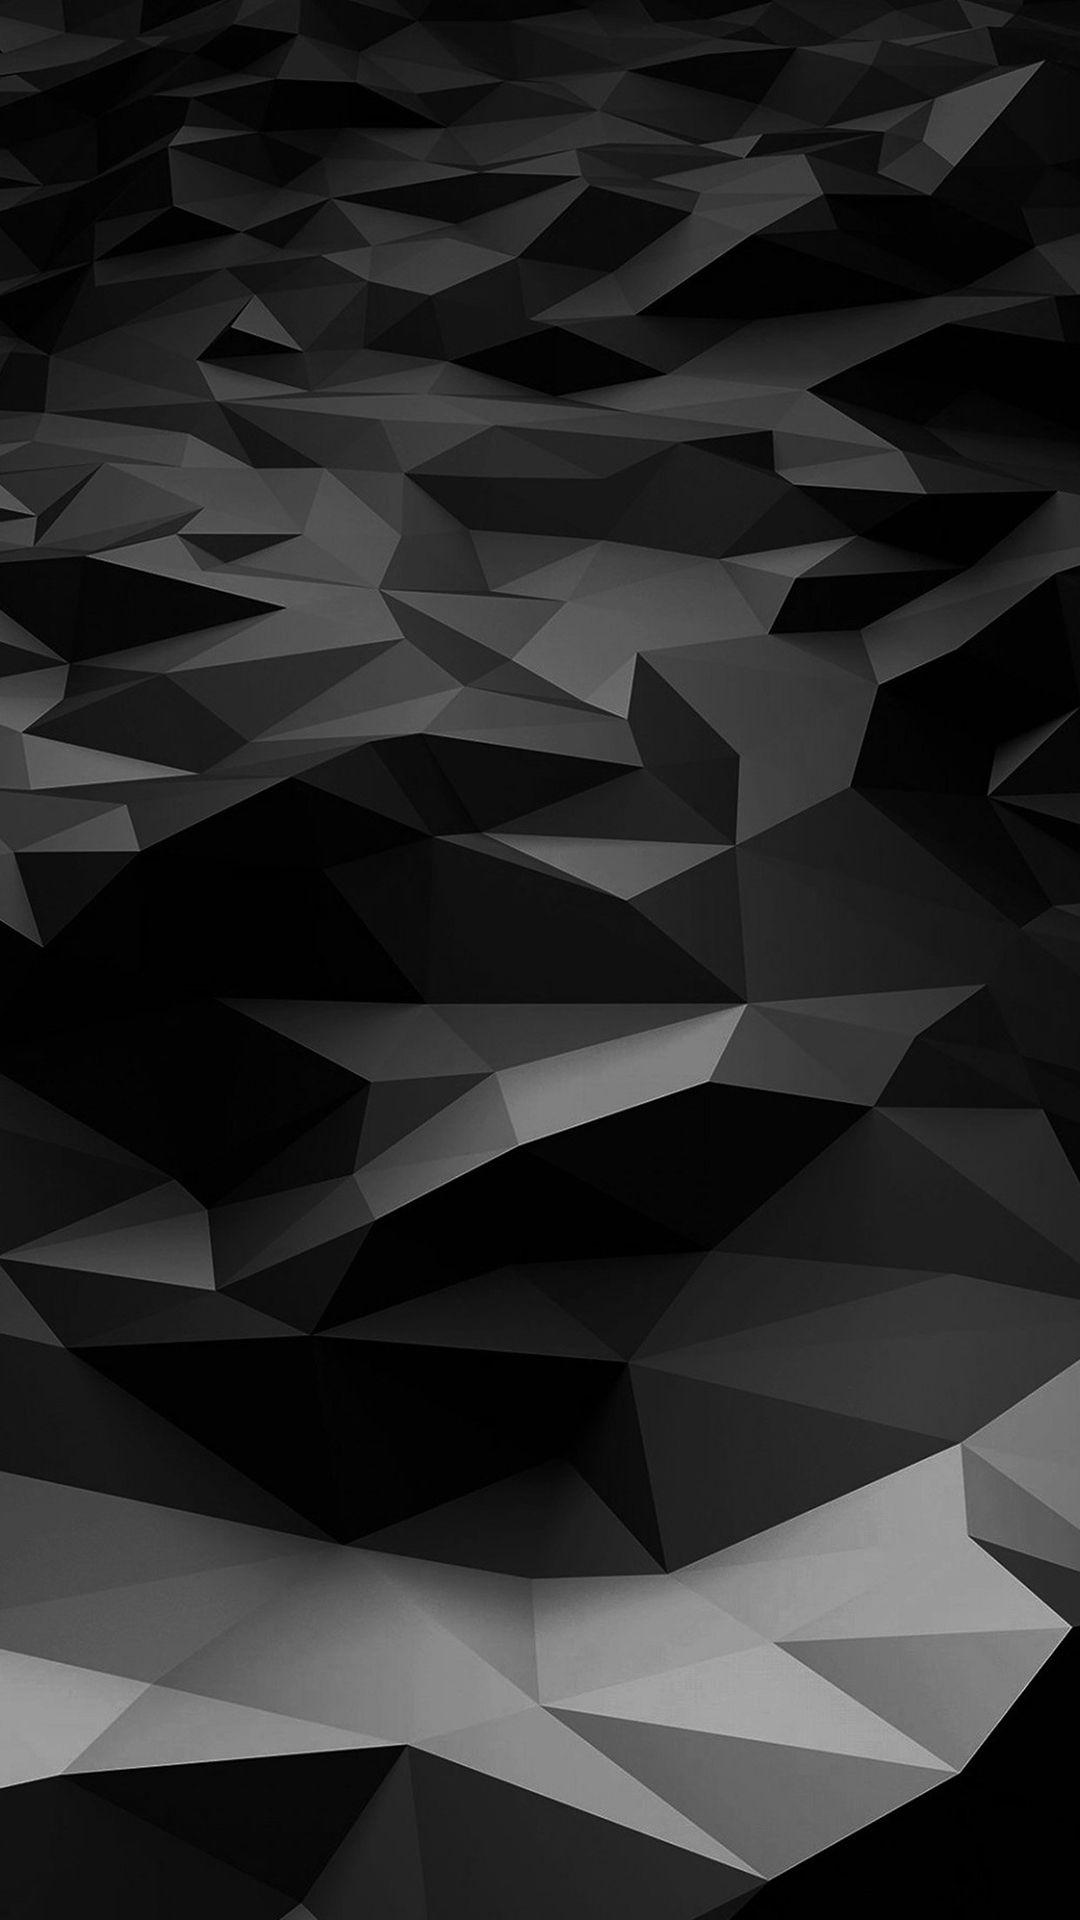 tumblr black wallpaper iphone